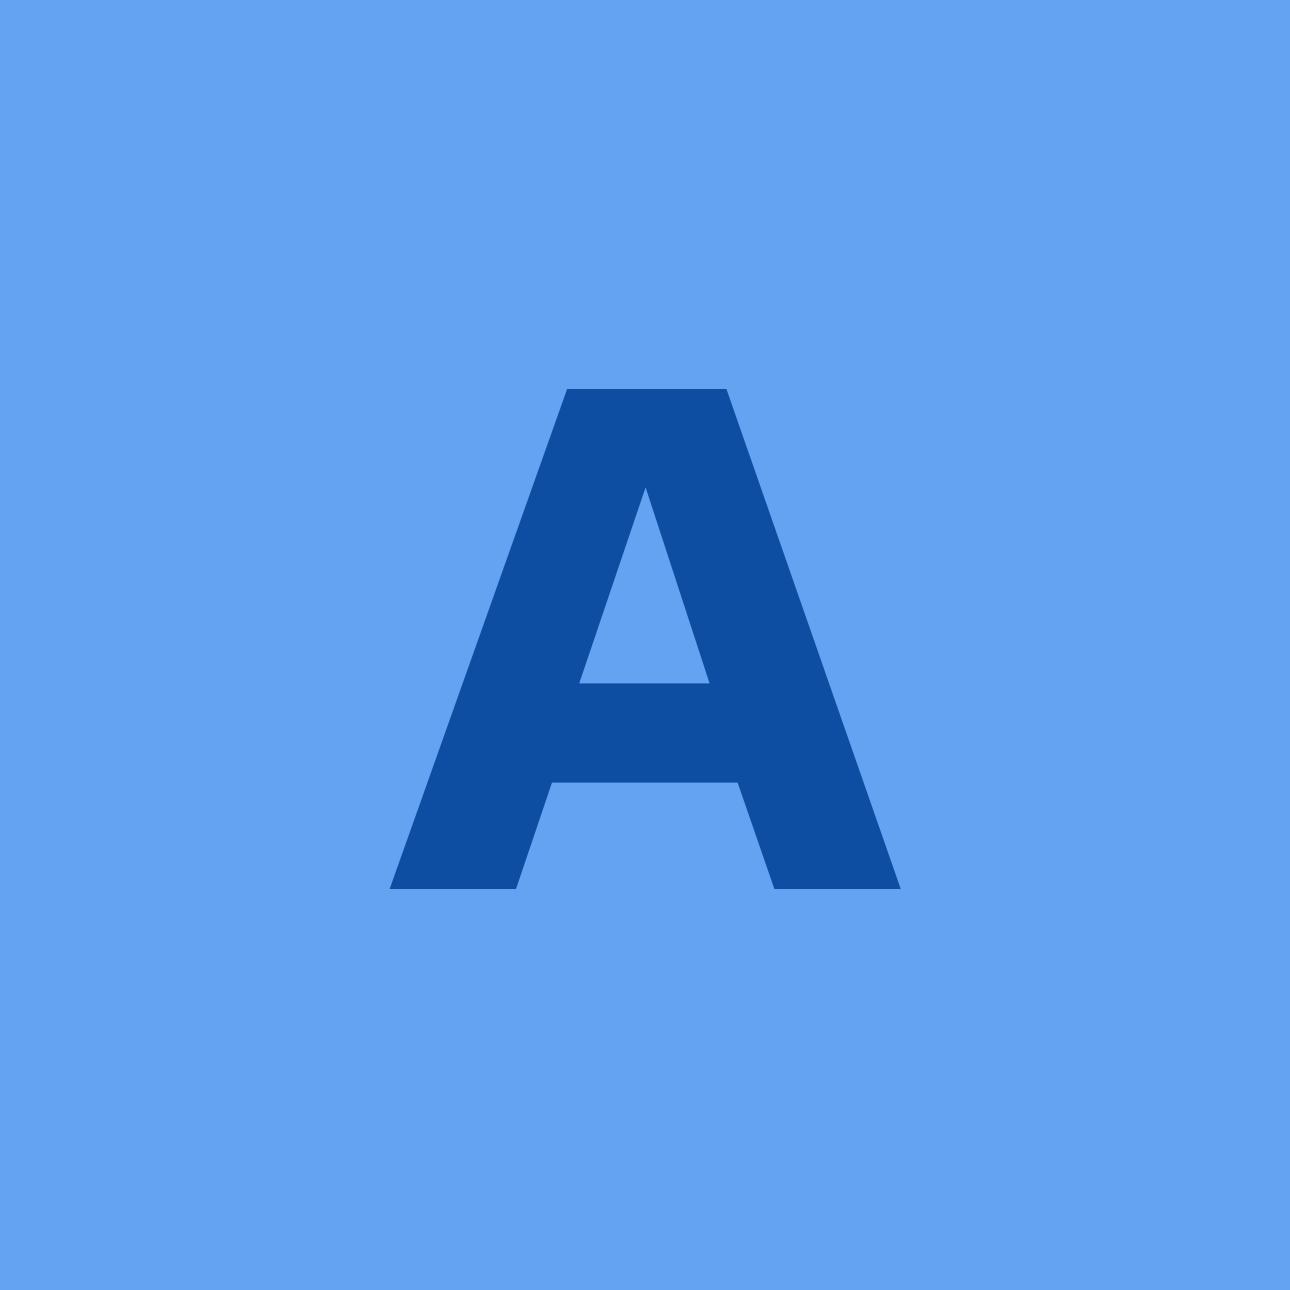 AB Enterprises Corp logo